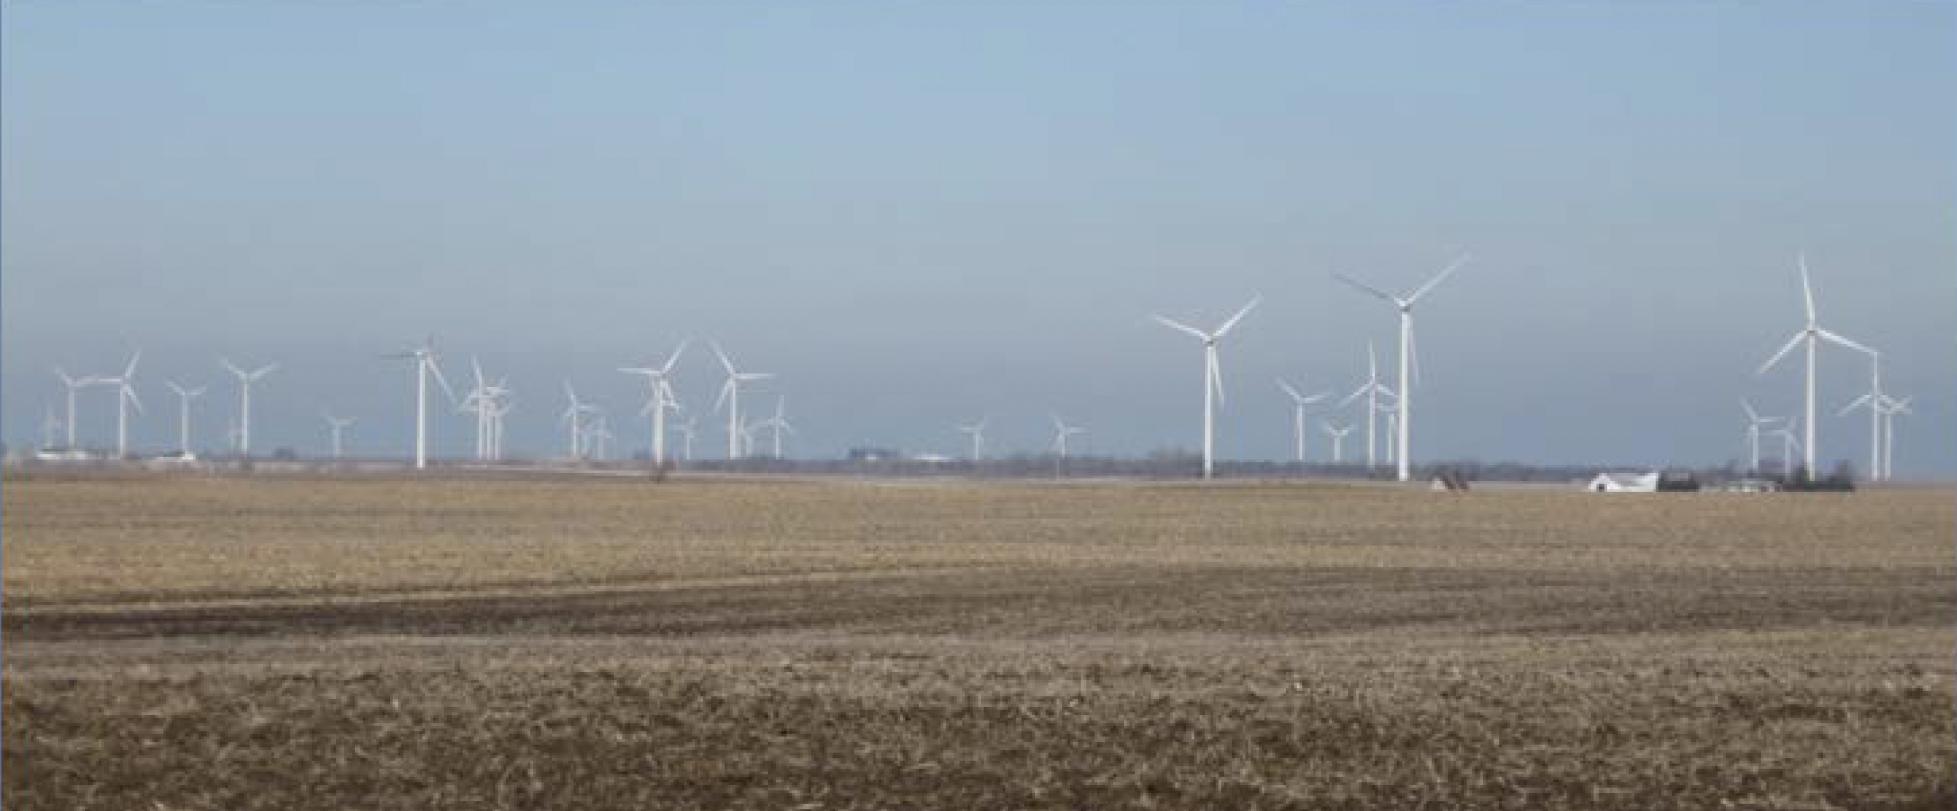 Fowler Ridge Wind Farm